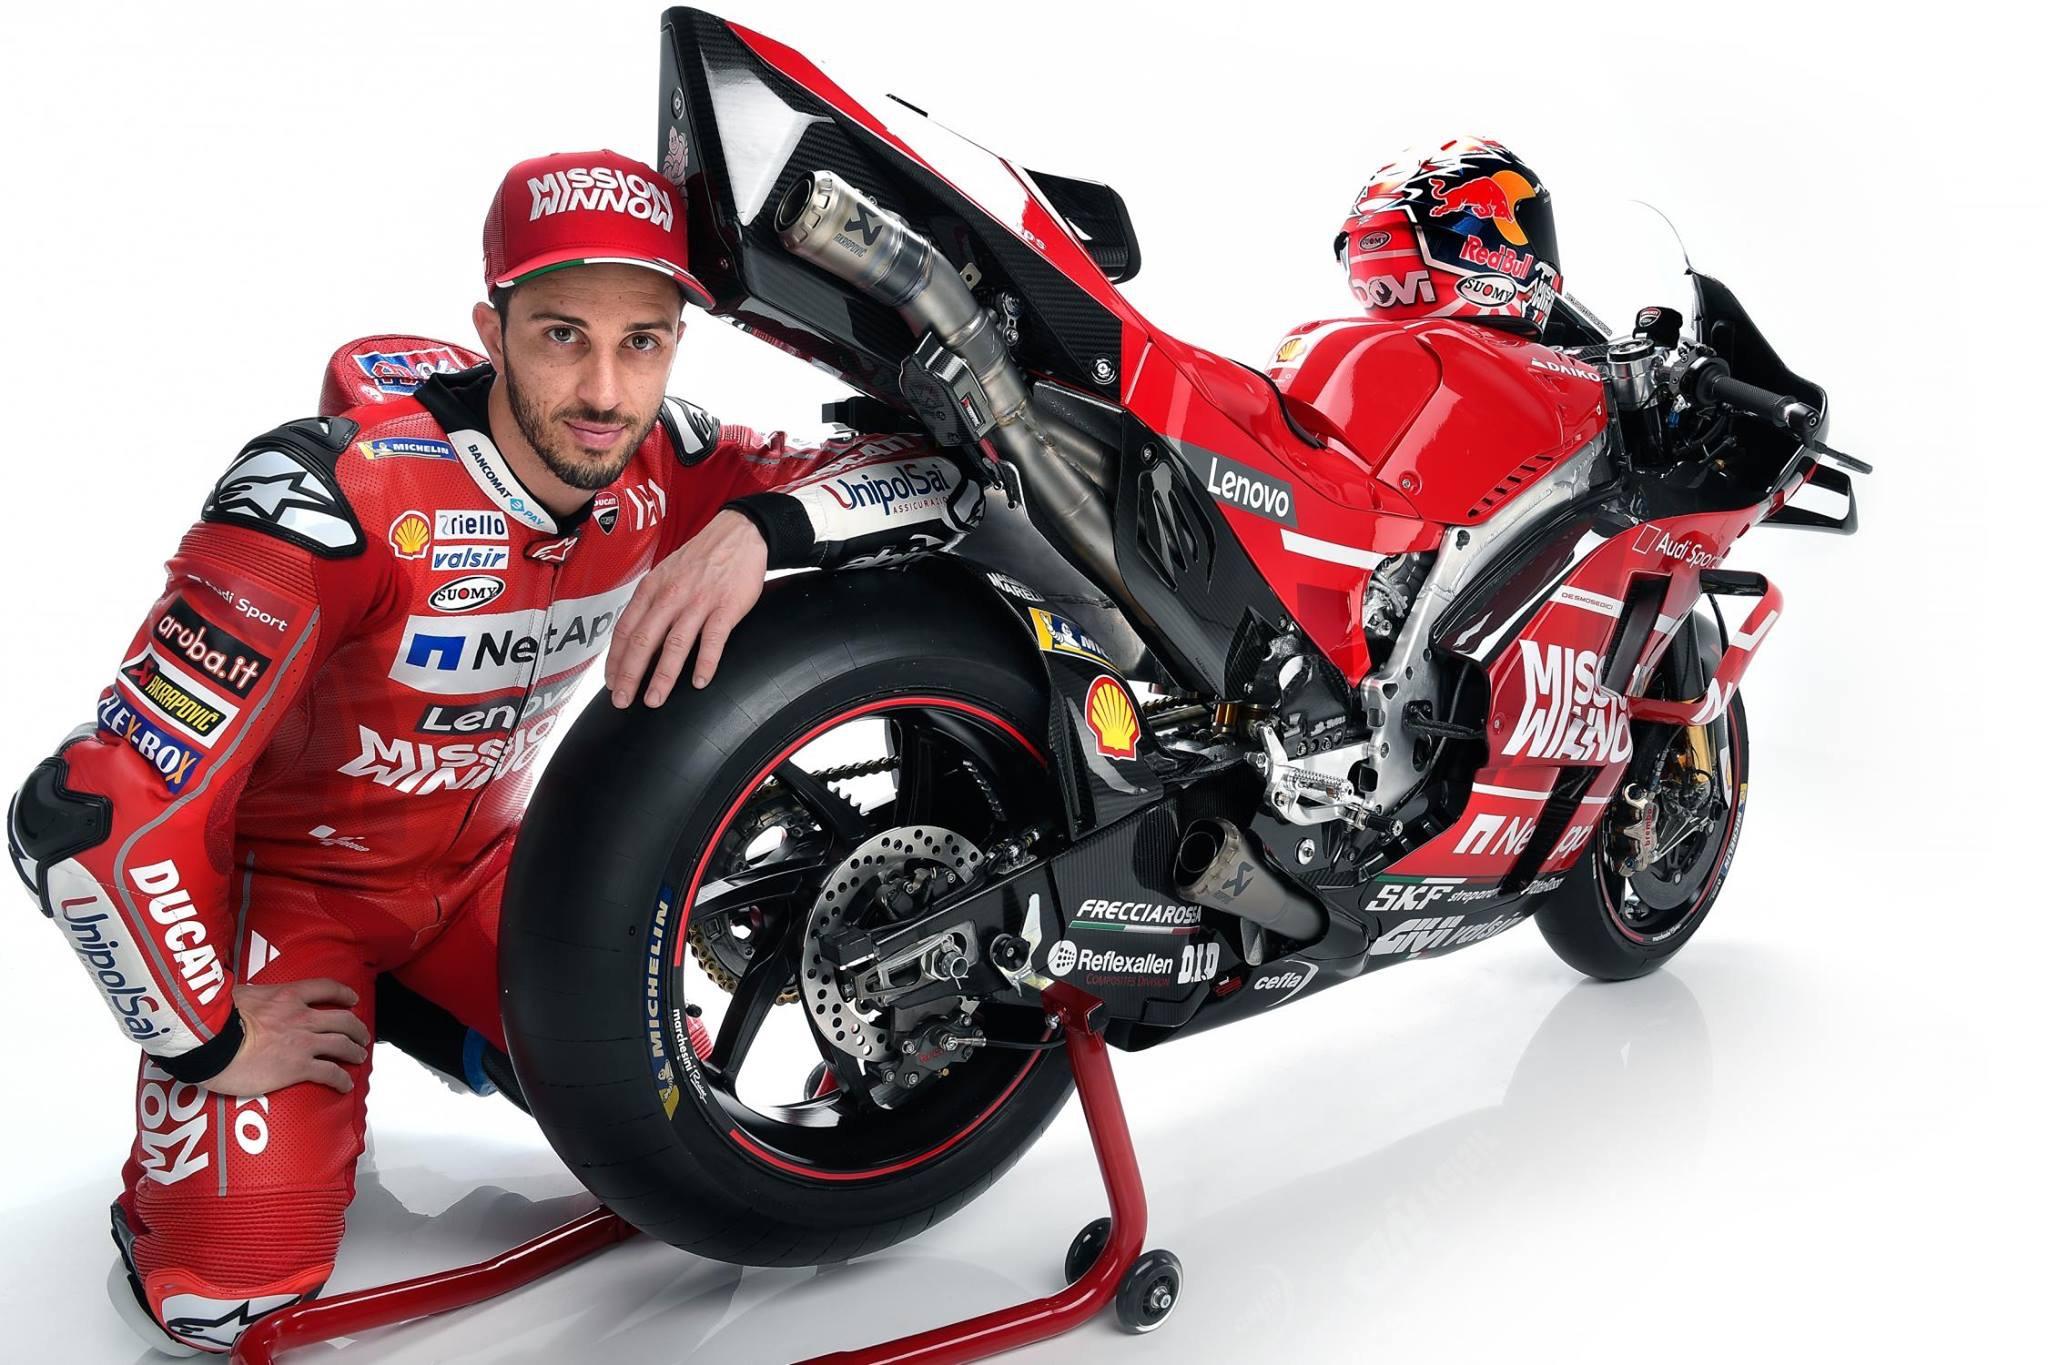 MotoGP Moto2 Moto3 2019  - Page 5 B300e110